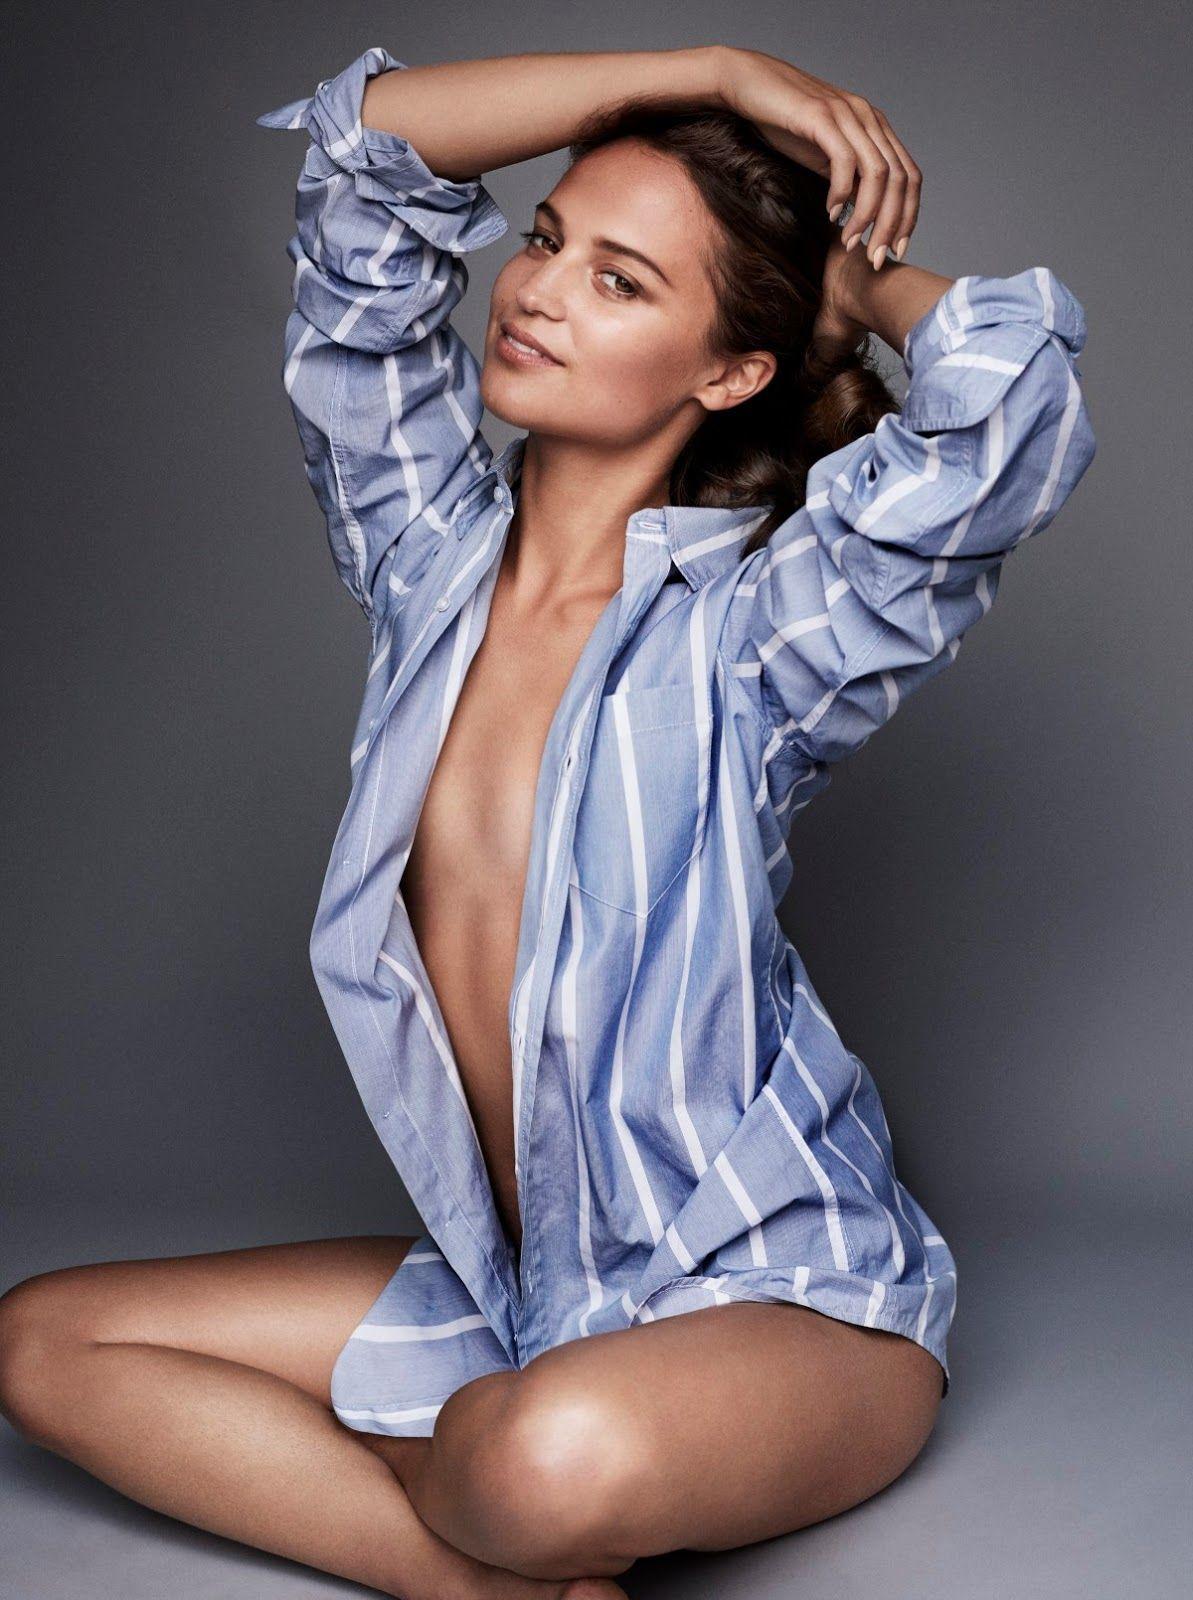 Topless Cleavage Alicia Vikander naked photo 2017